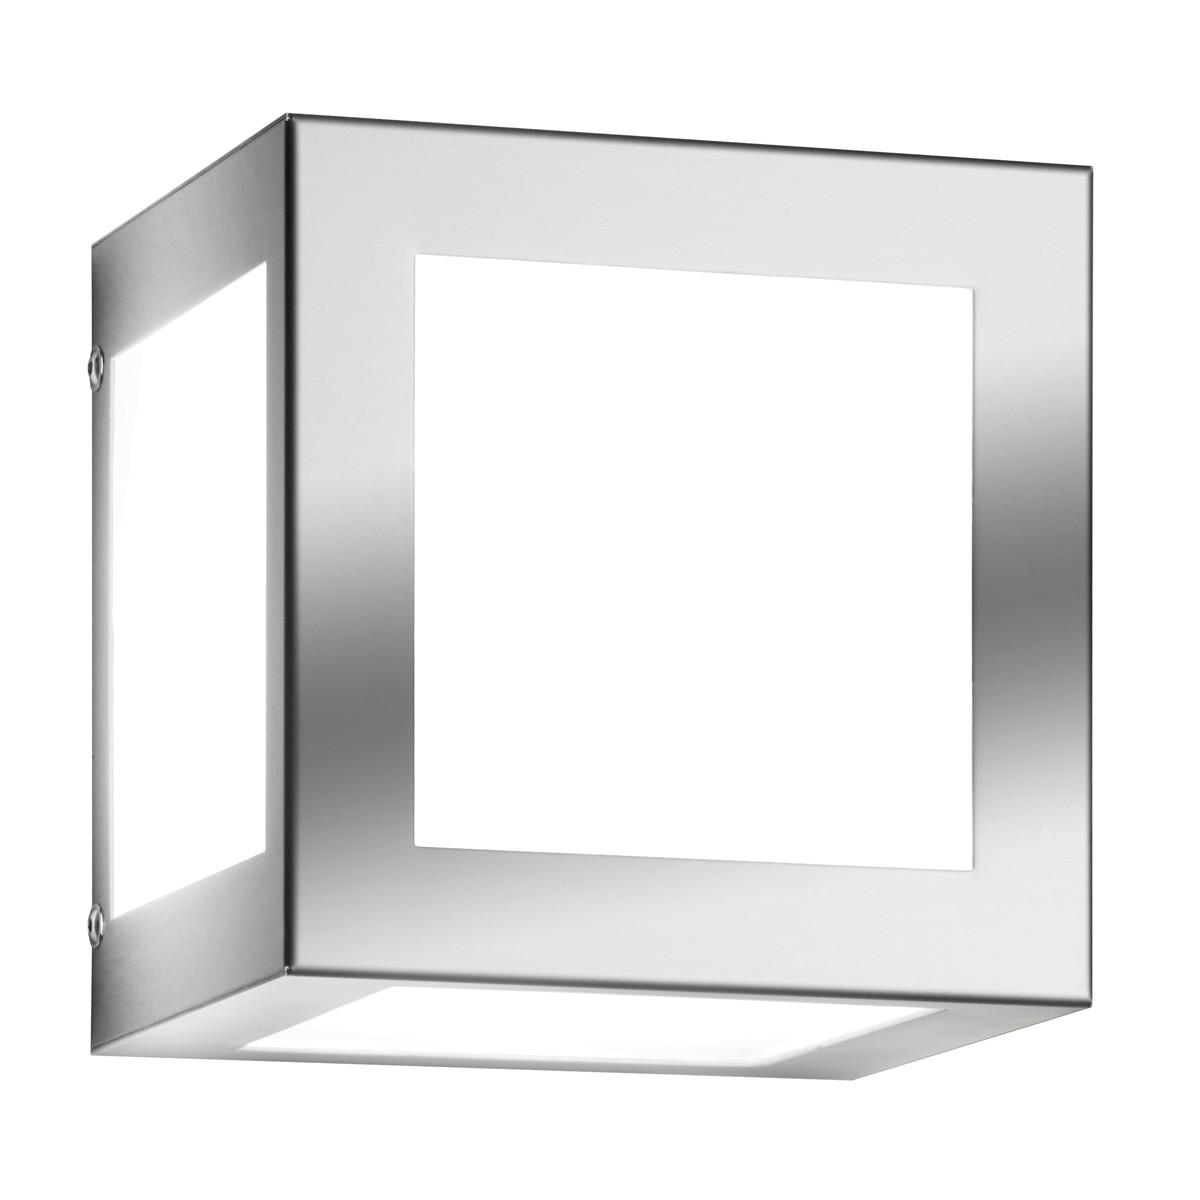 CMD Leuchten Aqua Cubo Wandleuchte, Edelstahl